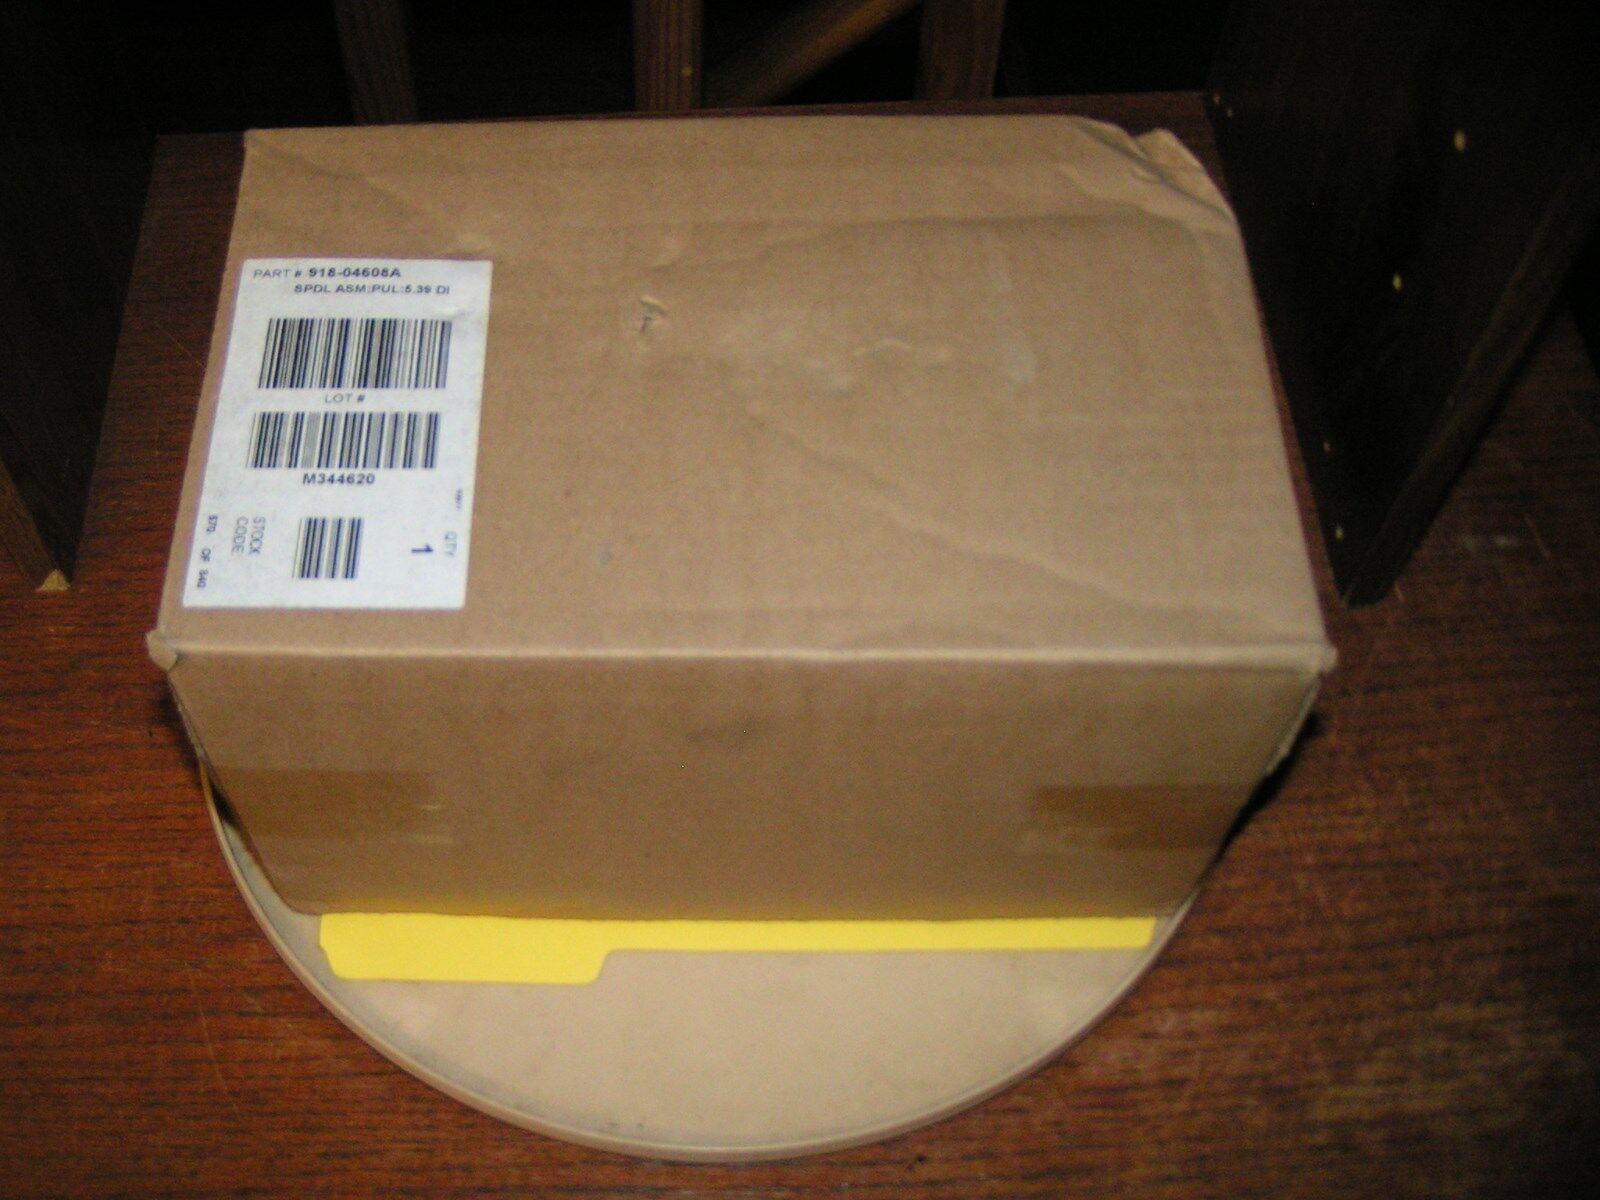 Cubierta De Corte MTD productos eje ASSY-parte  918-04608A 618-04608A - nuevo OEM PART